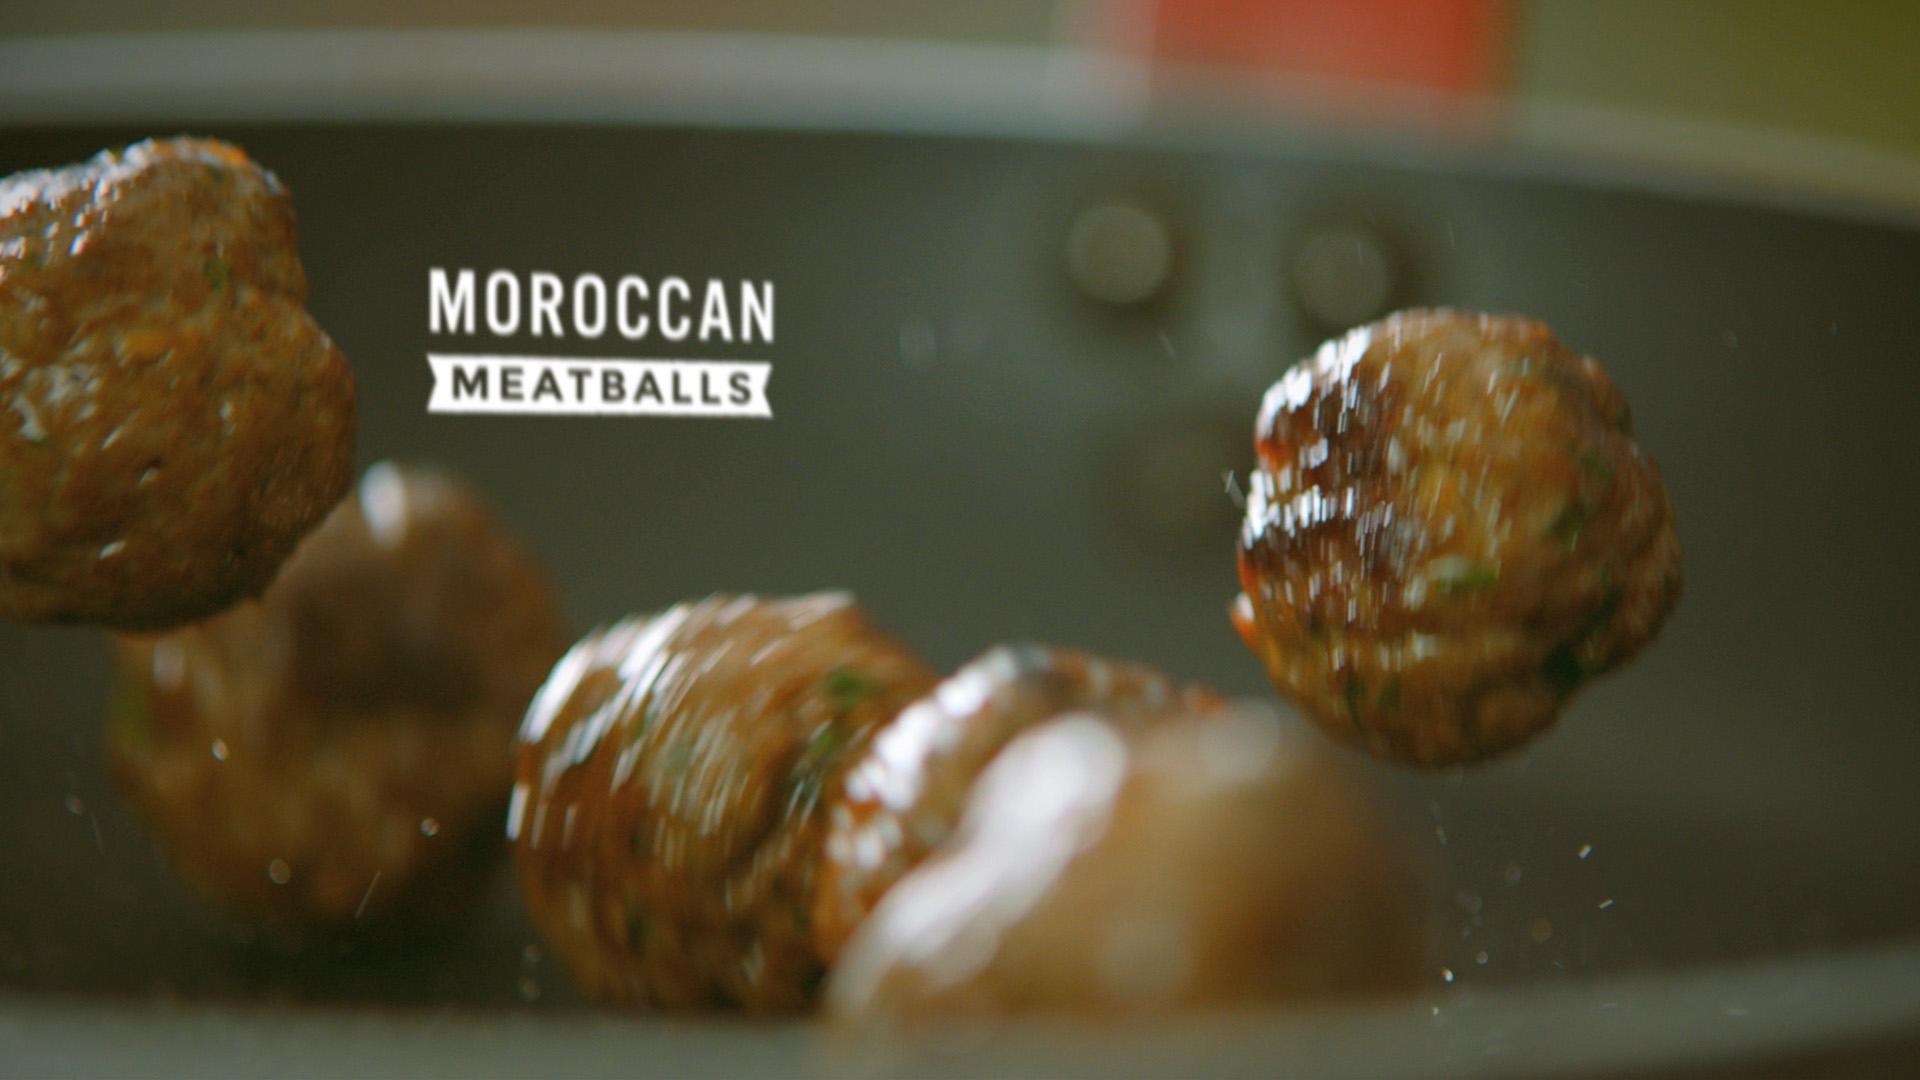 Meatballs Type